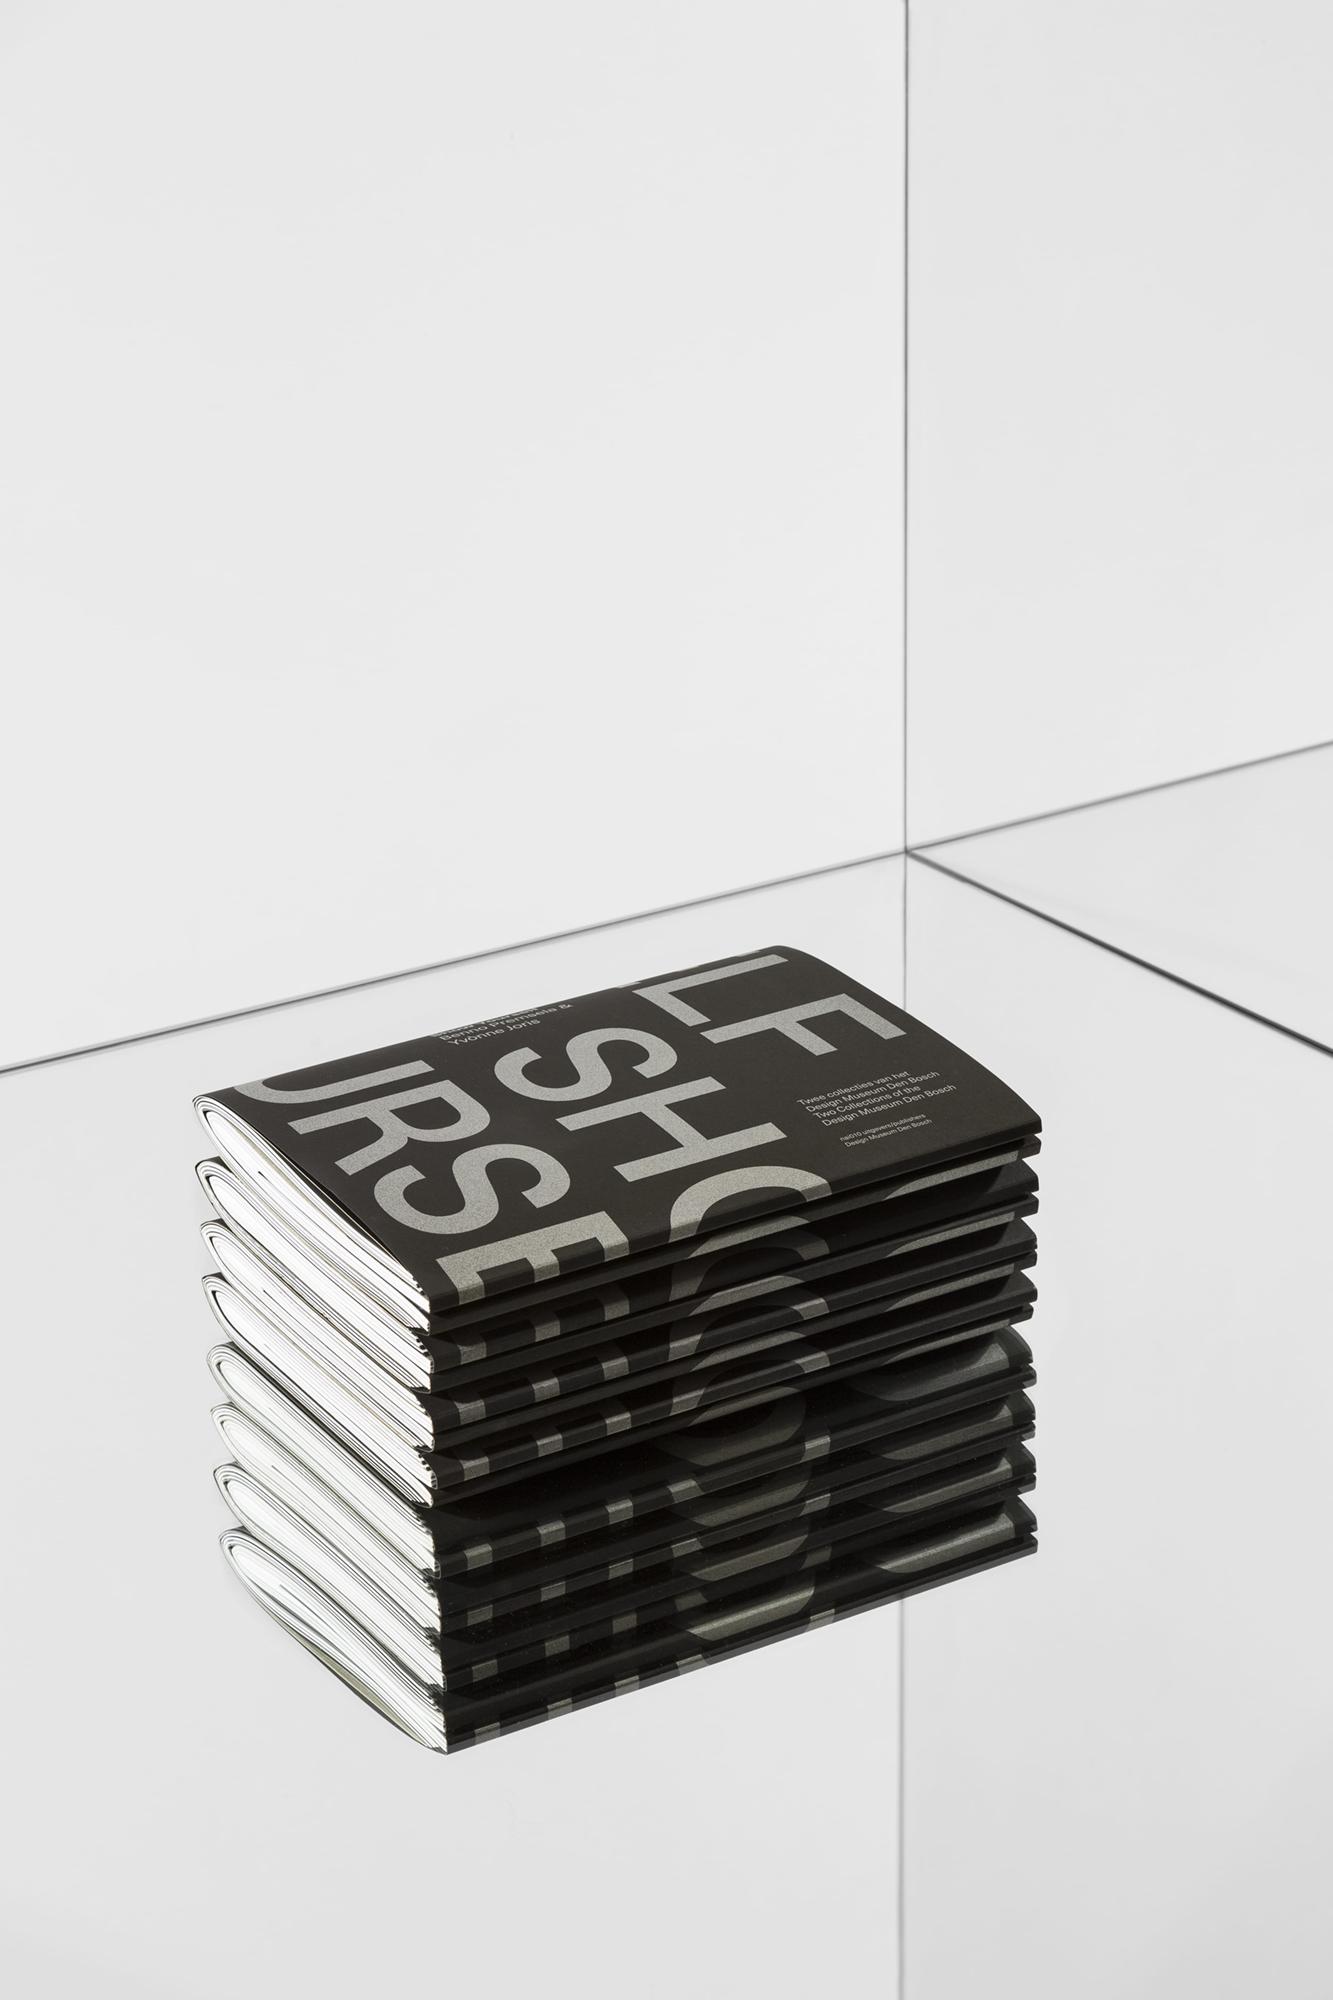 Haller Brun Show Yourself Benno Premsela Yvònne Joris Design Museum Den Bosch books